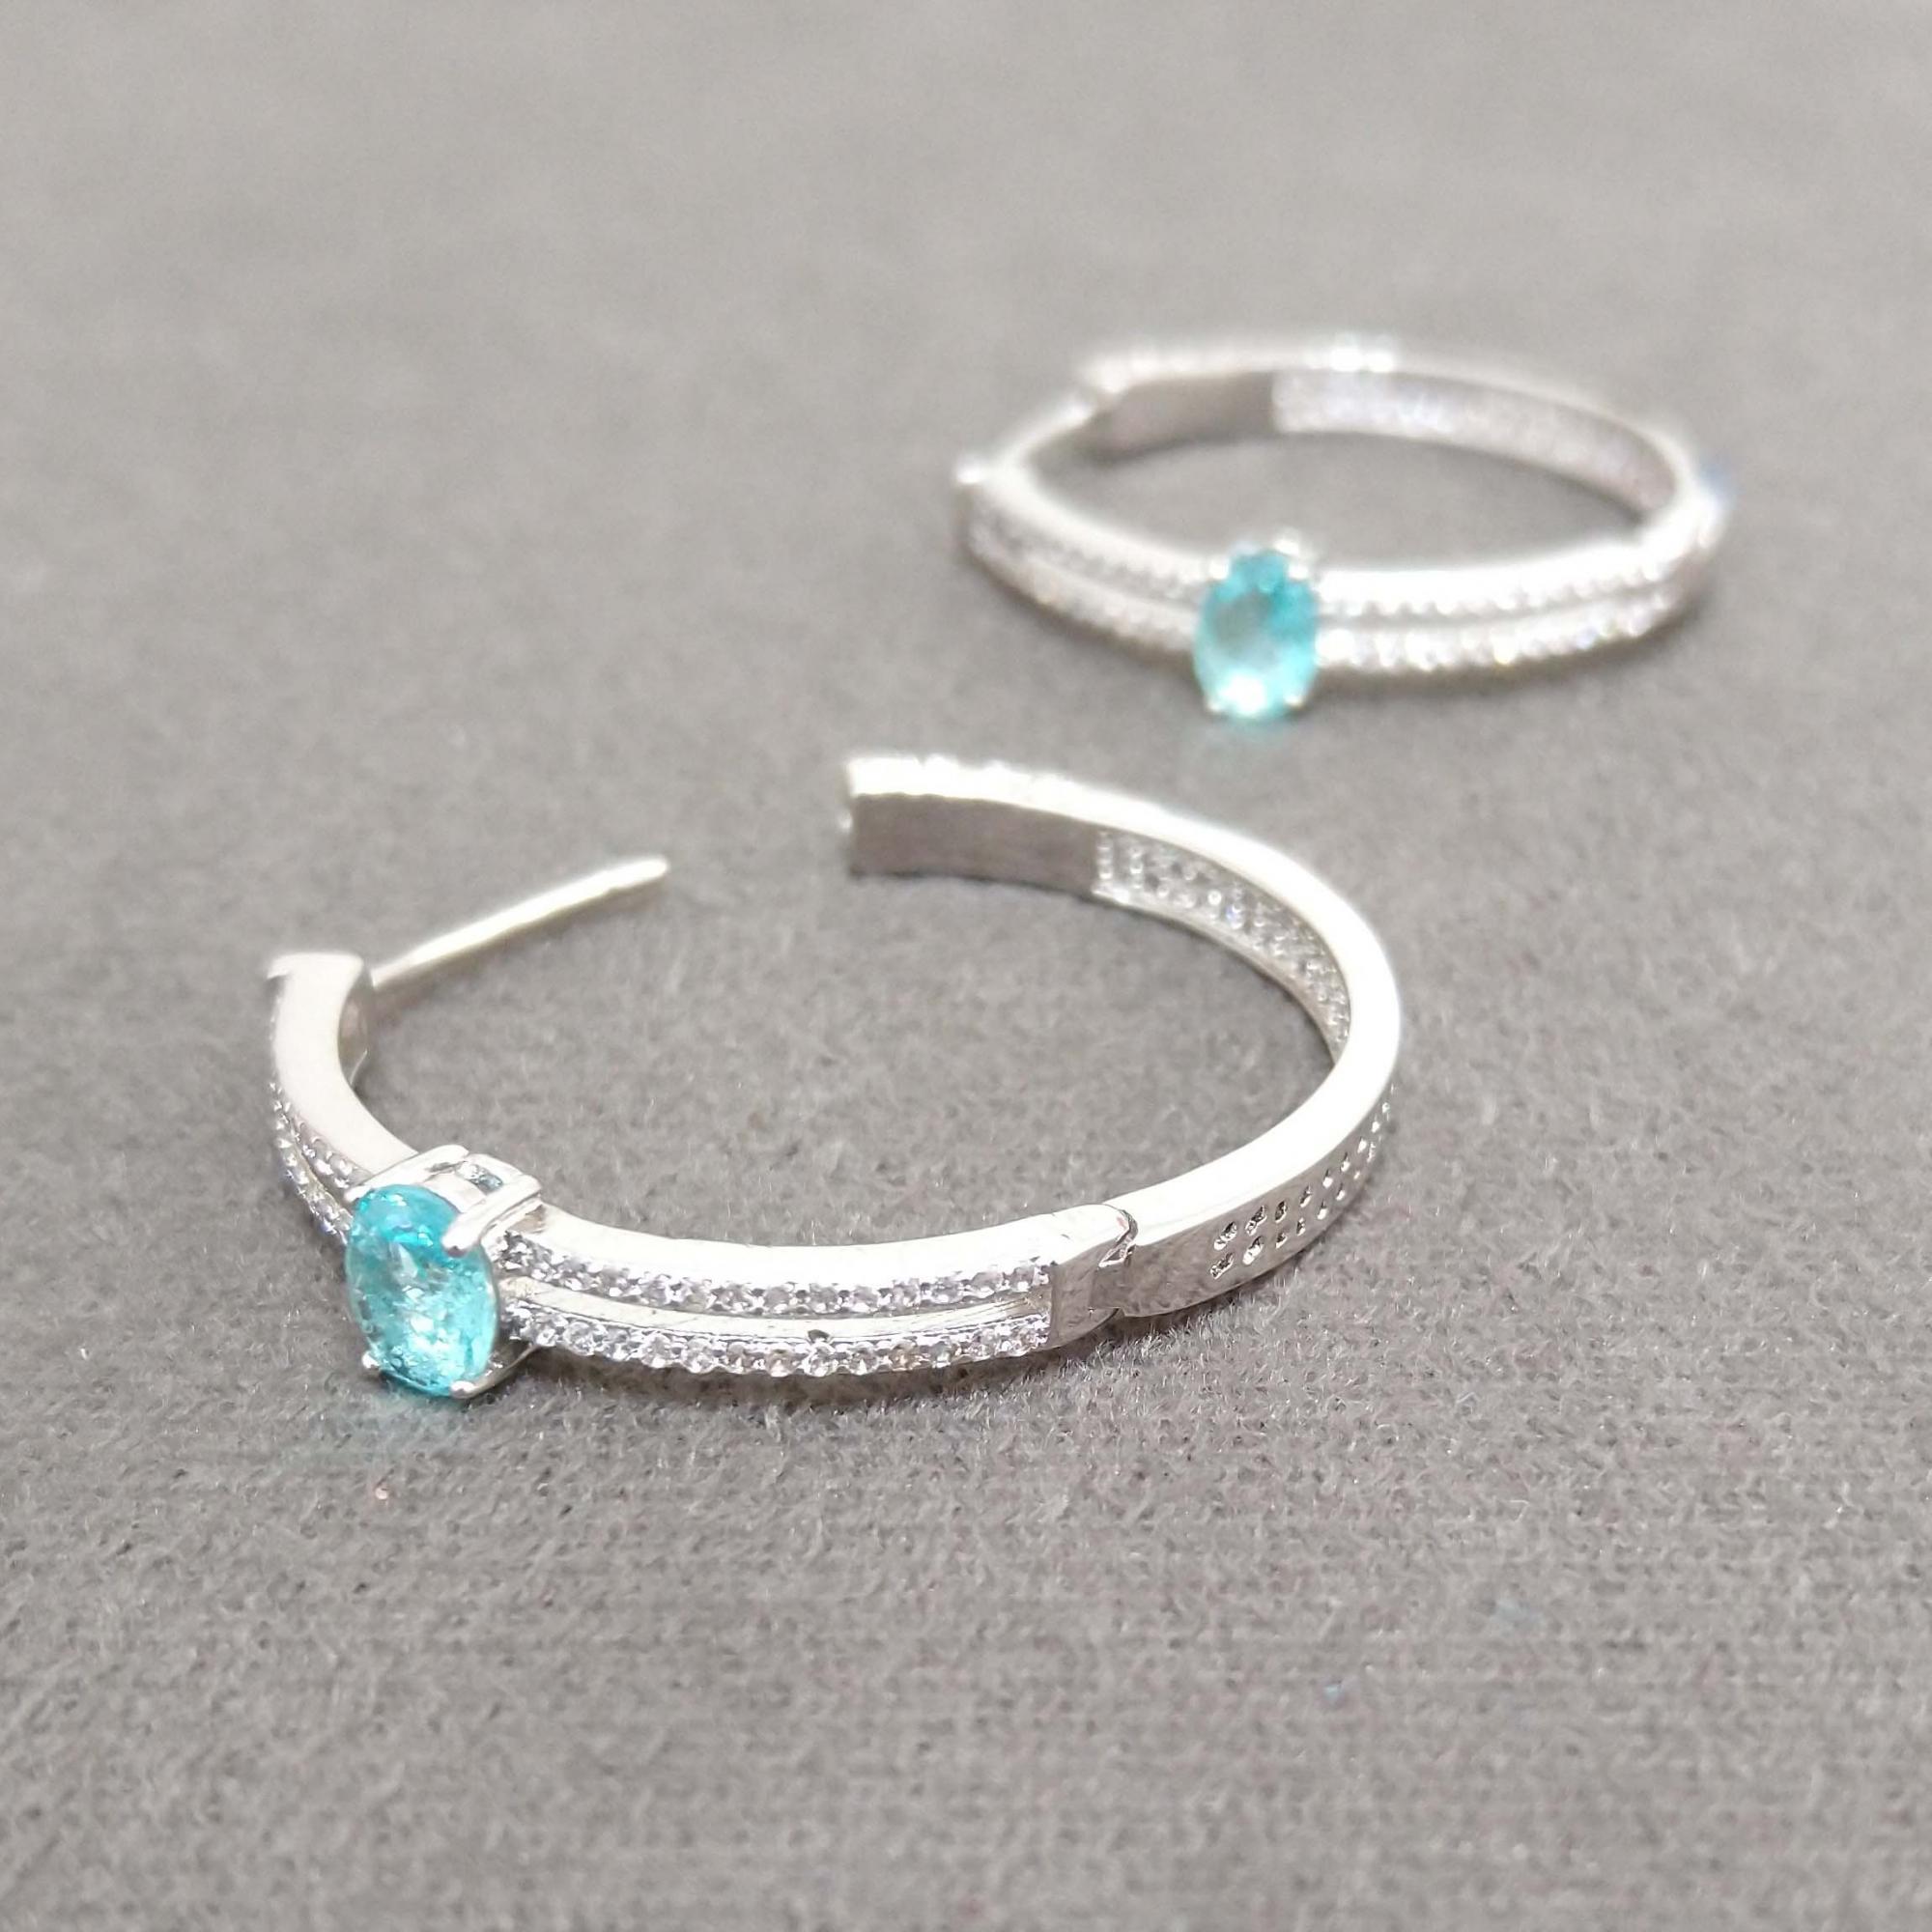 Brinco Argola Luxo Festa Cravejada com Cristal Azul Turquesa banho Ródio Branco